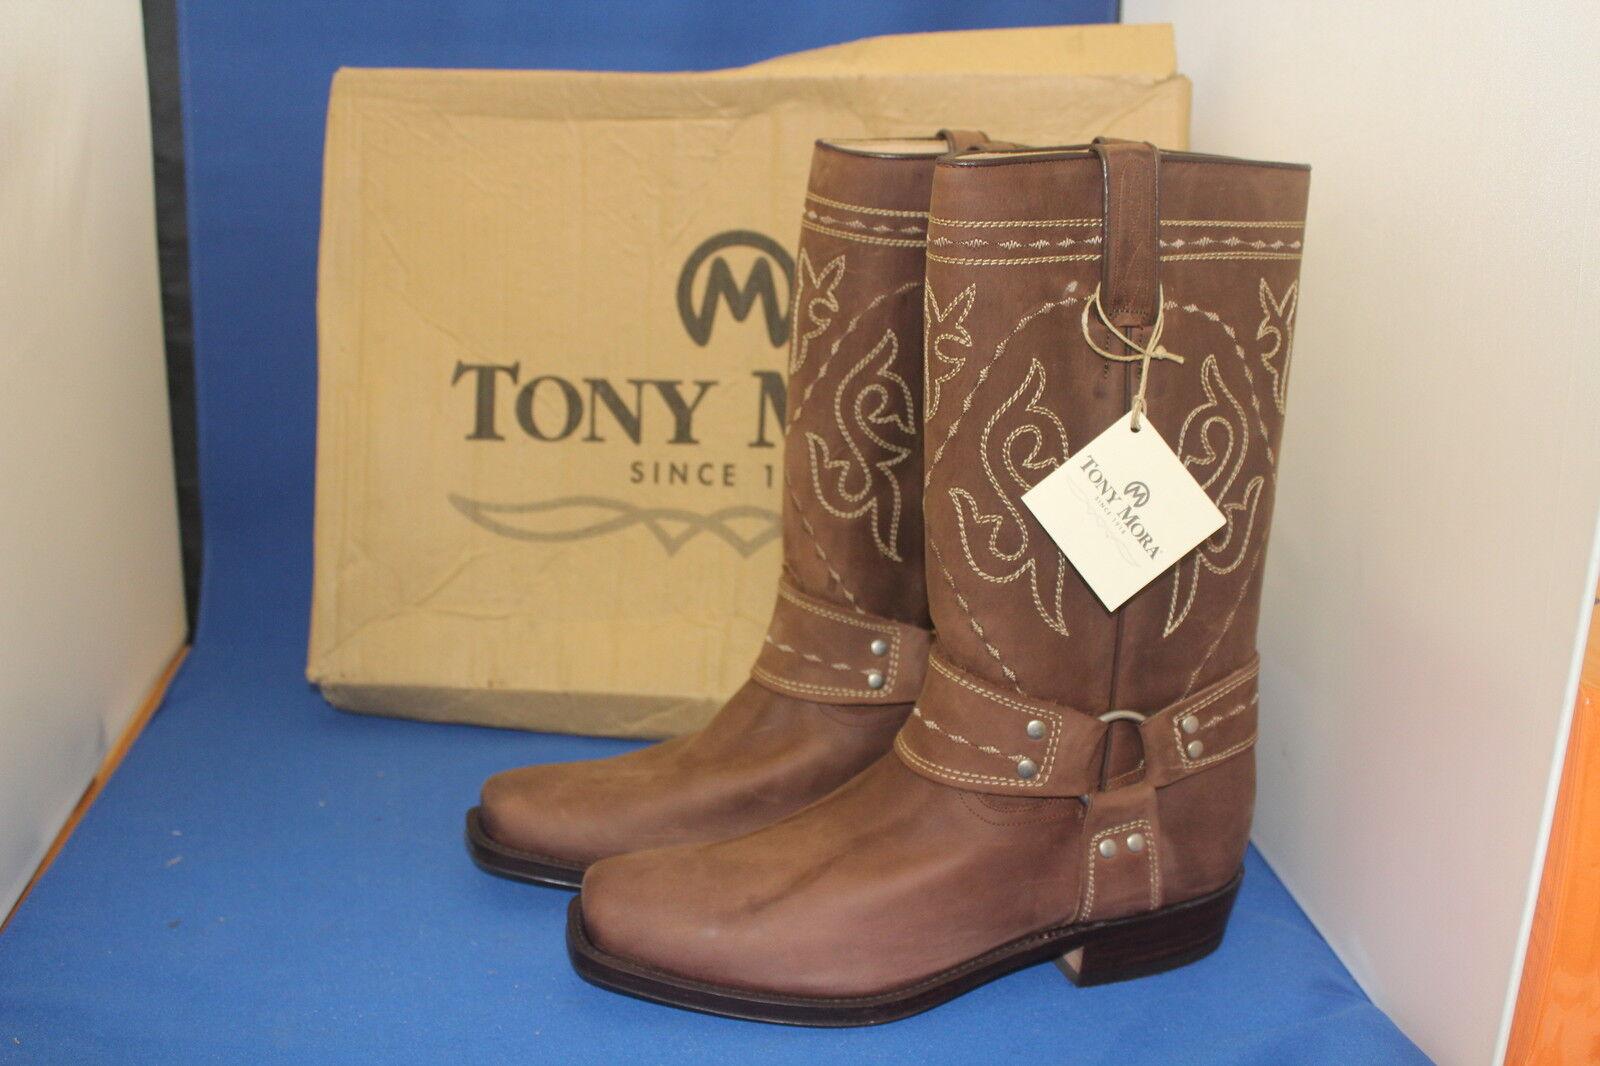 TONY MORA Boots Stiefel Biker  westernstiefel cowboystiefel  gr. 43  neu  leder